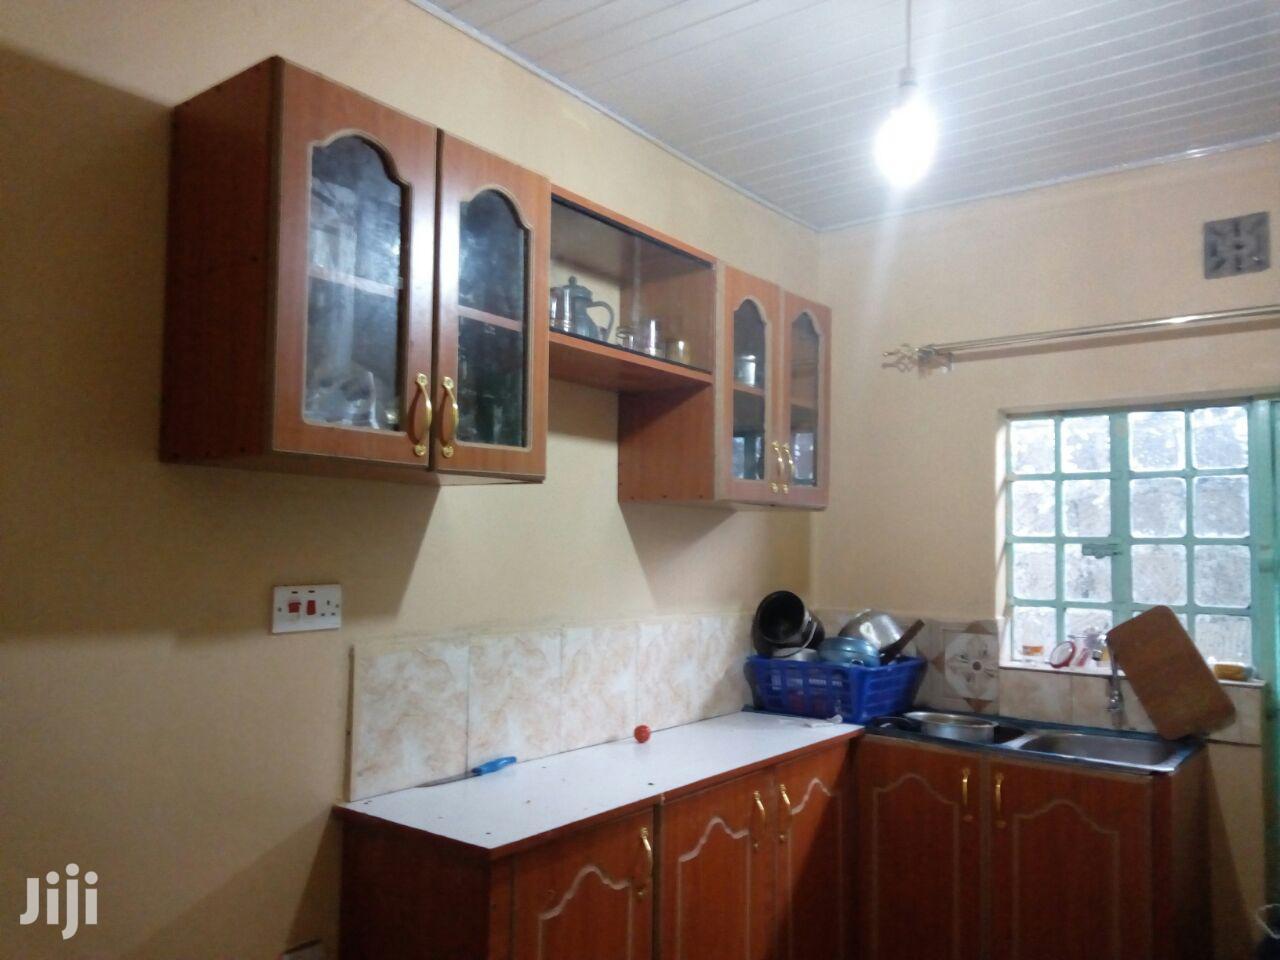 "3bdr Bungalow Sitting On 50"" By 80"" Plot | Houses & Apartments For Sale for sale in Ruiru, Kiambu, Kenya"